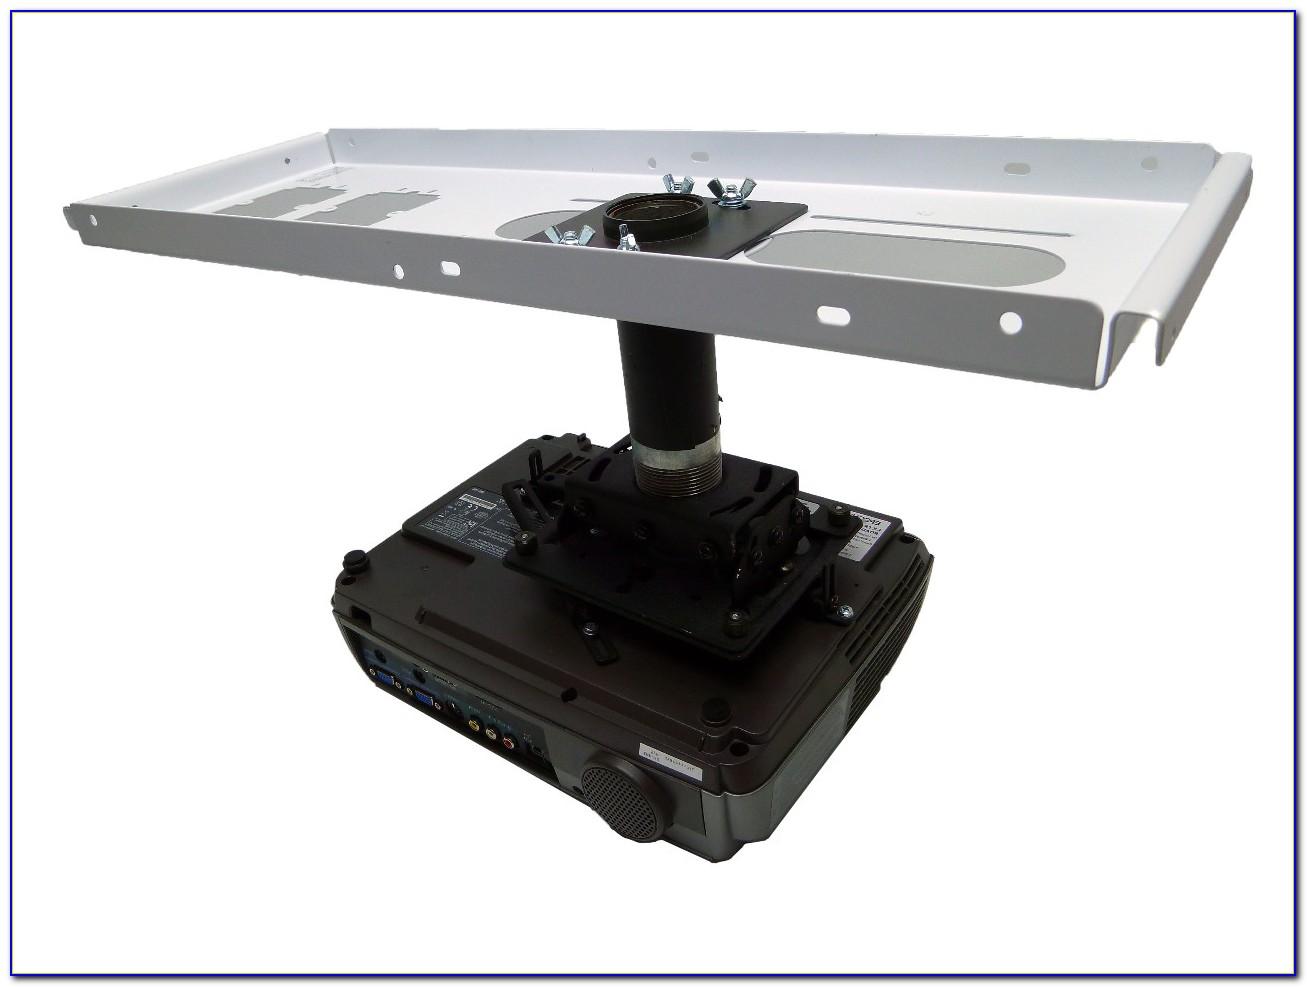 Epson Projector Ceiling Mount Bracket